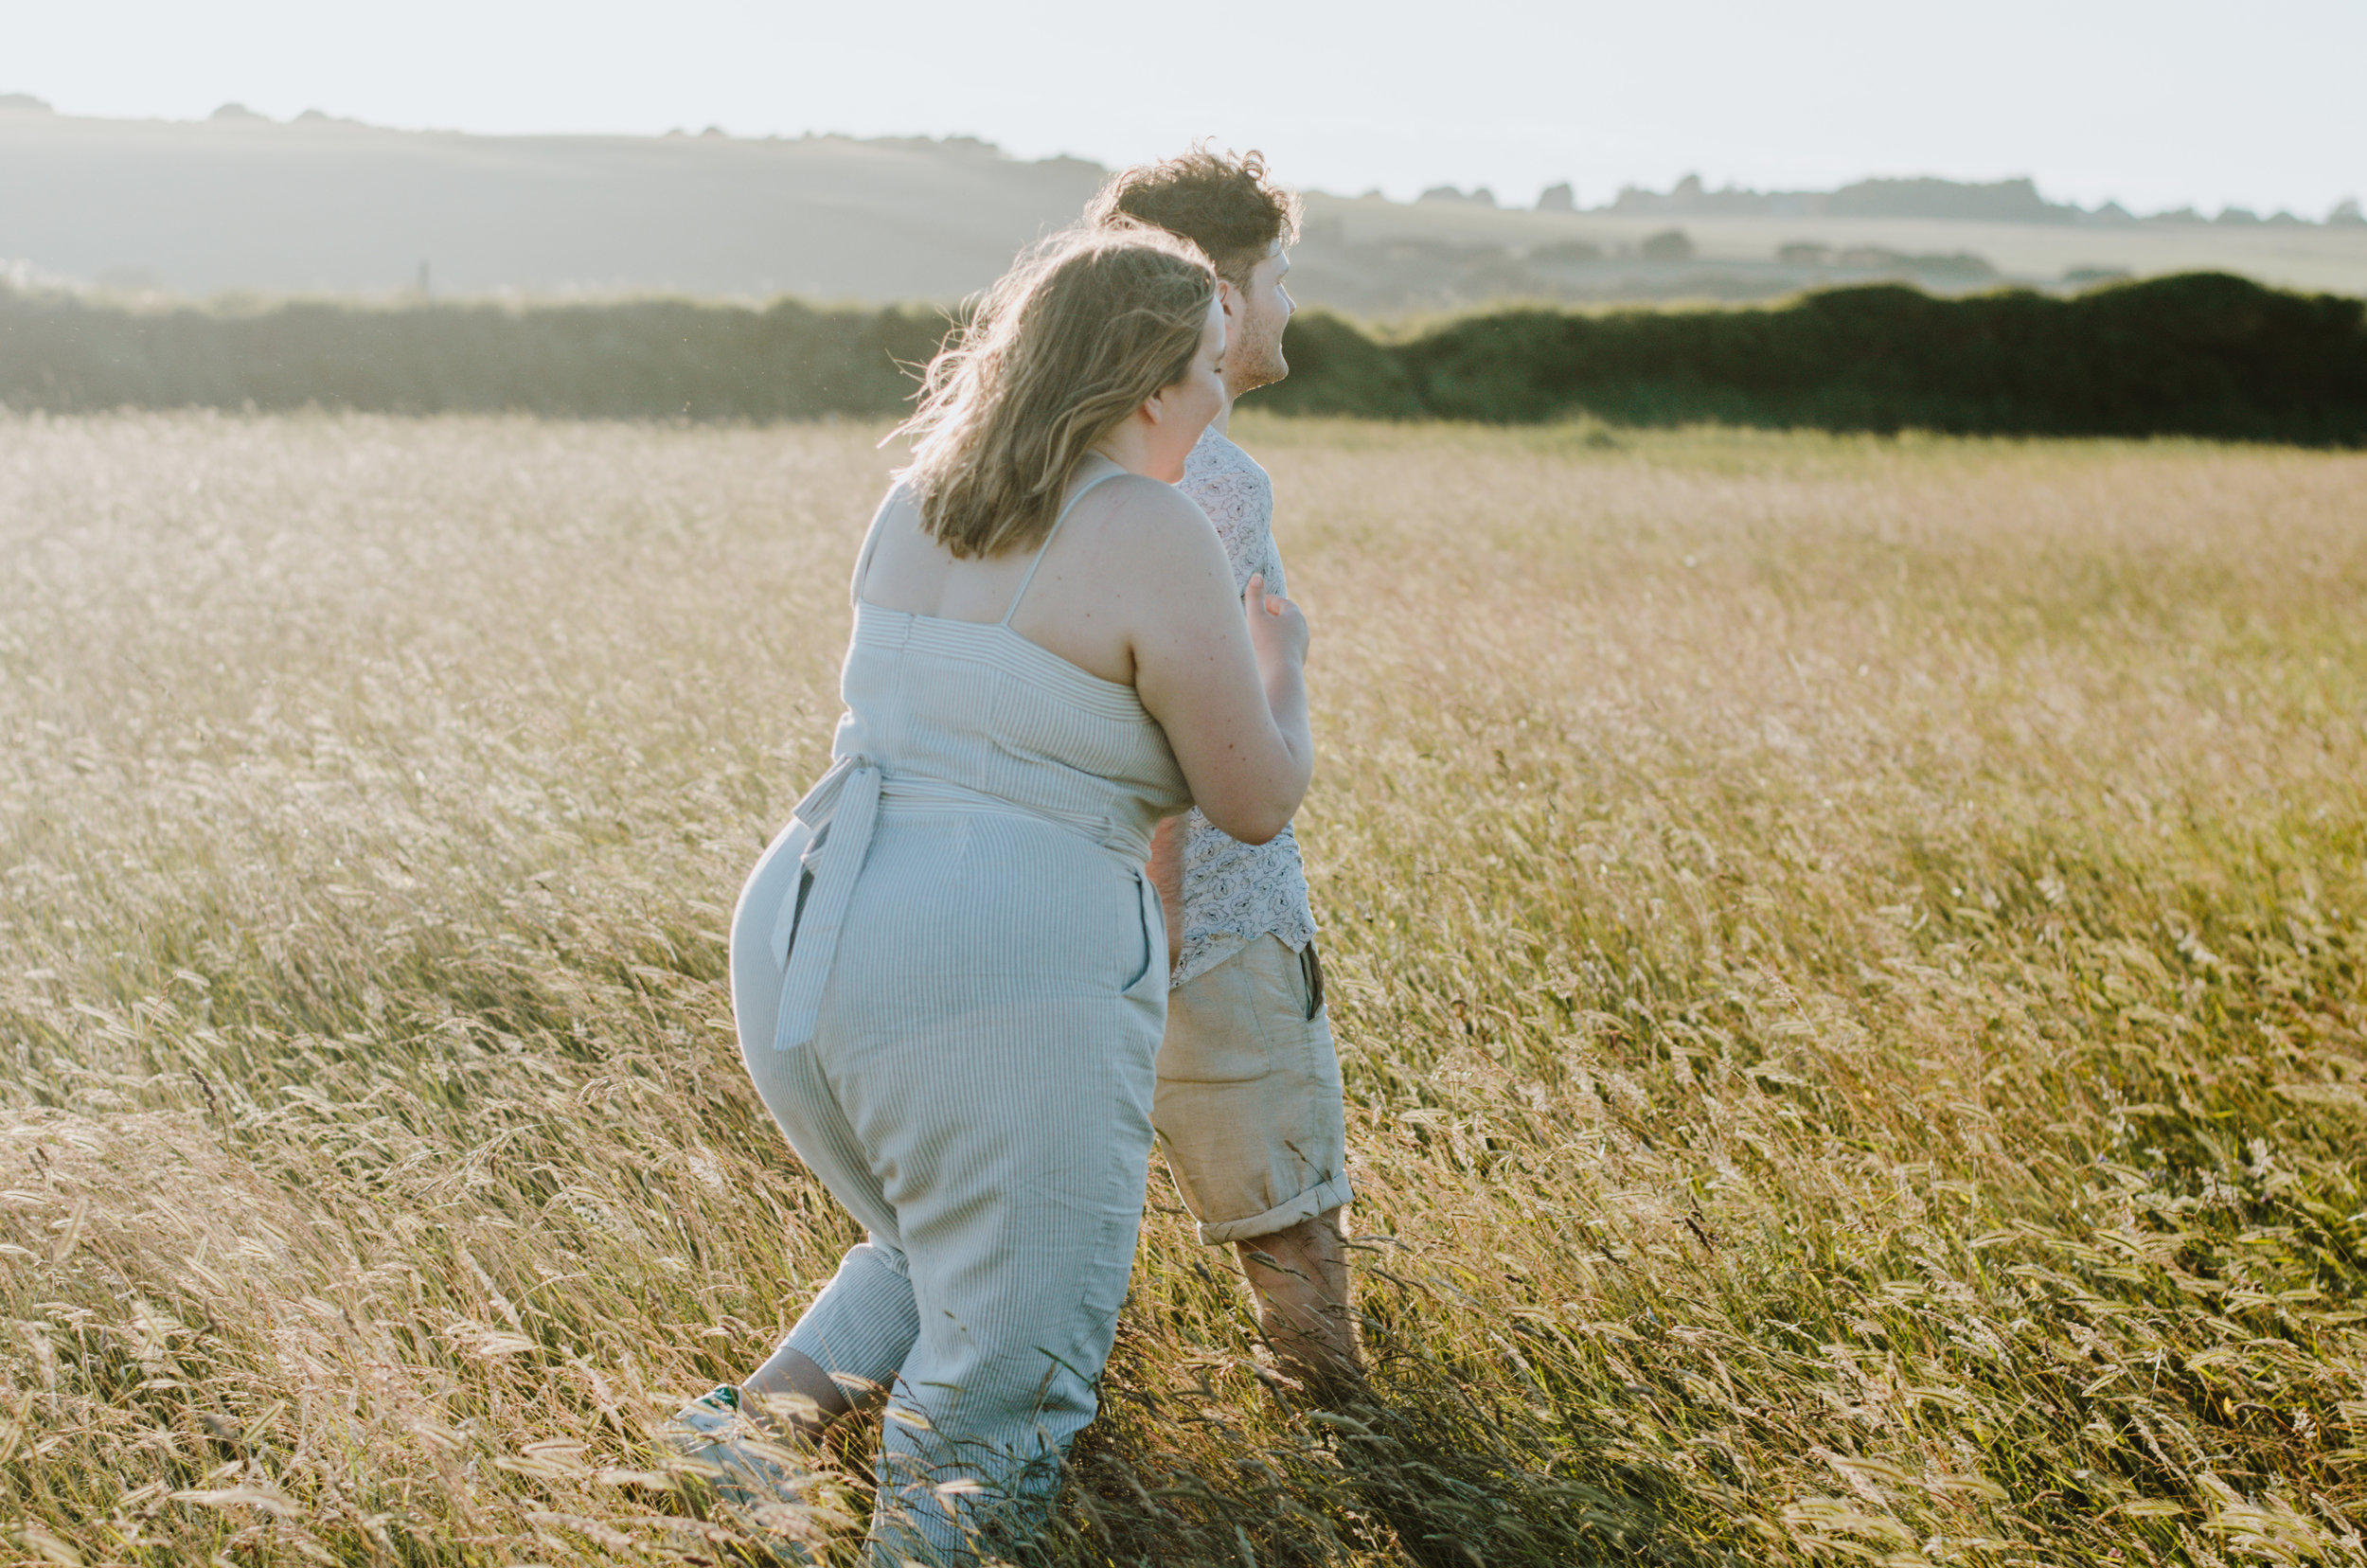 Rebecca & Dougie - Cuckmere Haven - Couple Session - Aiste Saulyte Photography-4.jpg